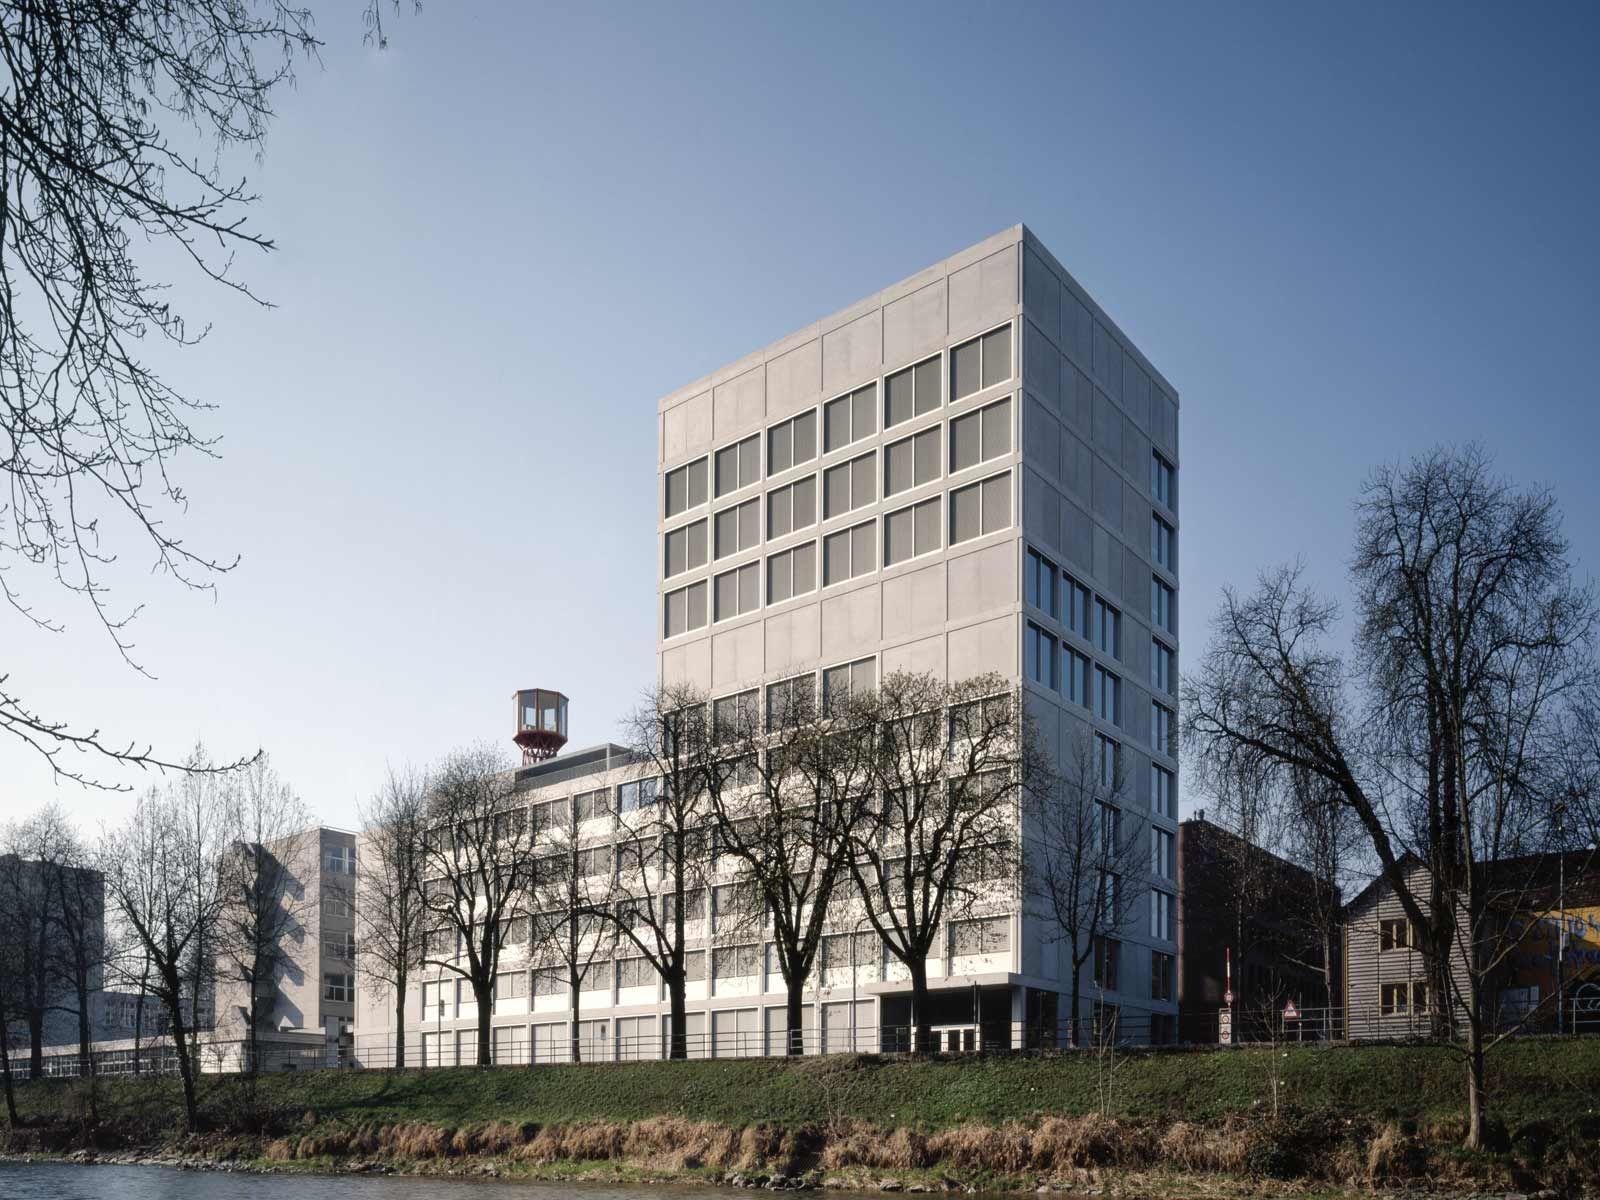 Stuecheli Architekten, Berufsfachschule